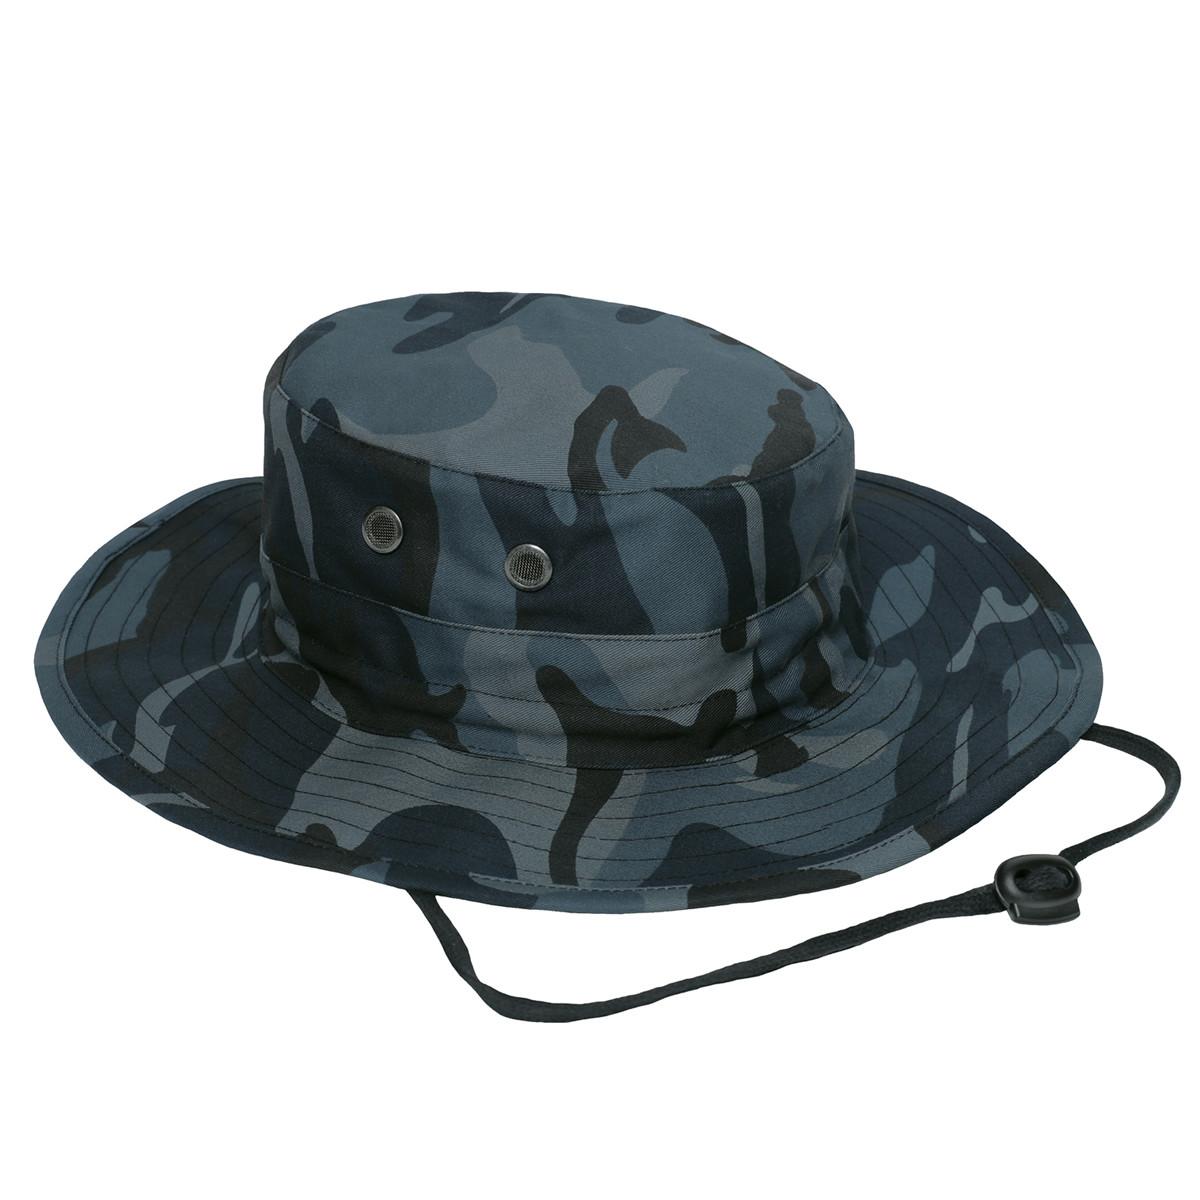 0ff62005 Shop Adjustable Midnight Camo Boonie Hats - Fatigues Army Navy